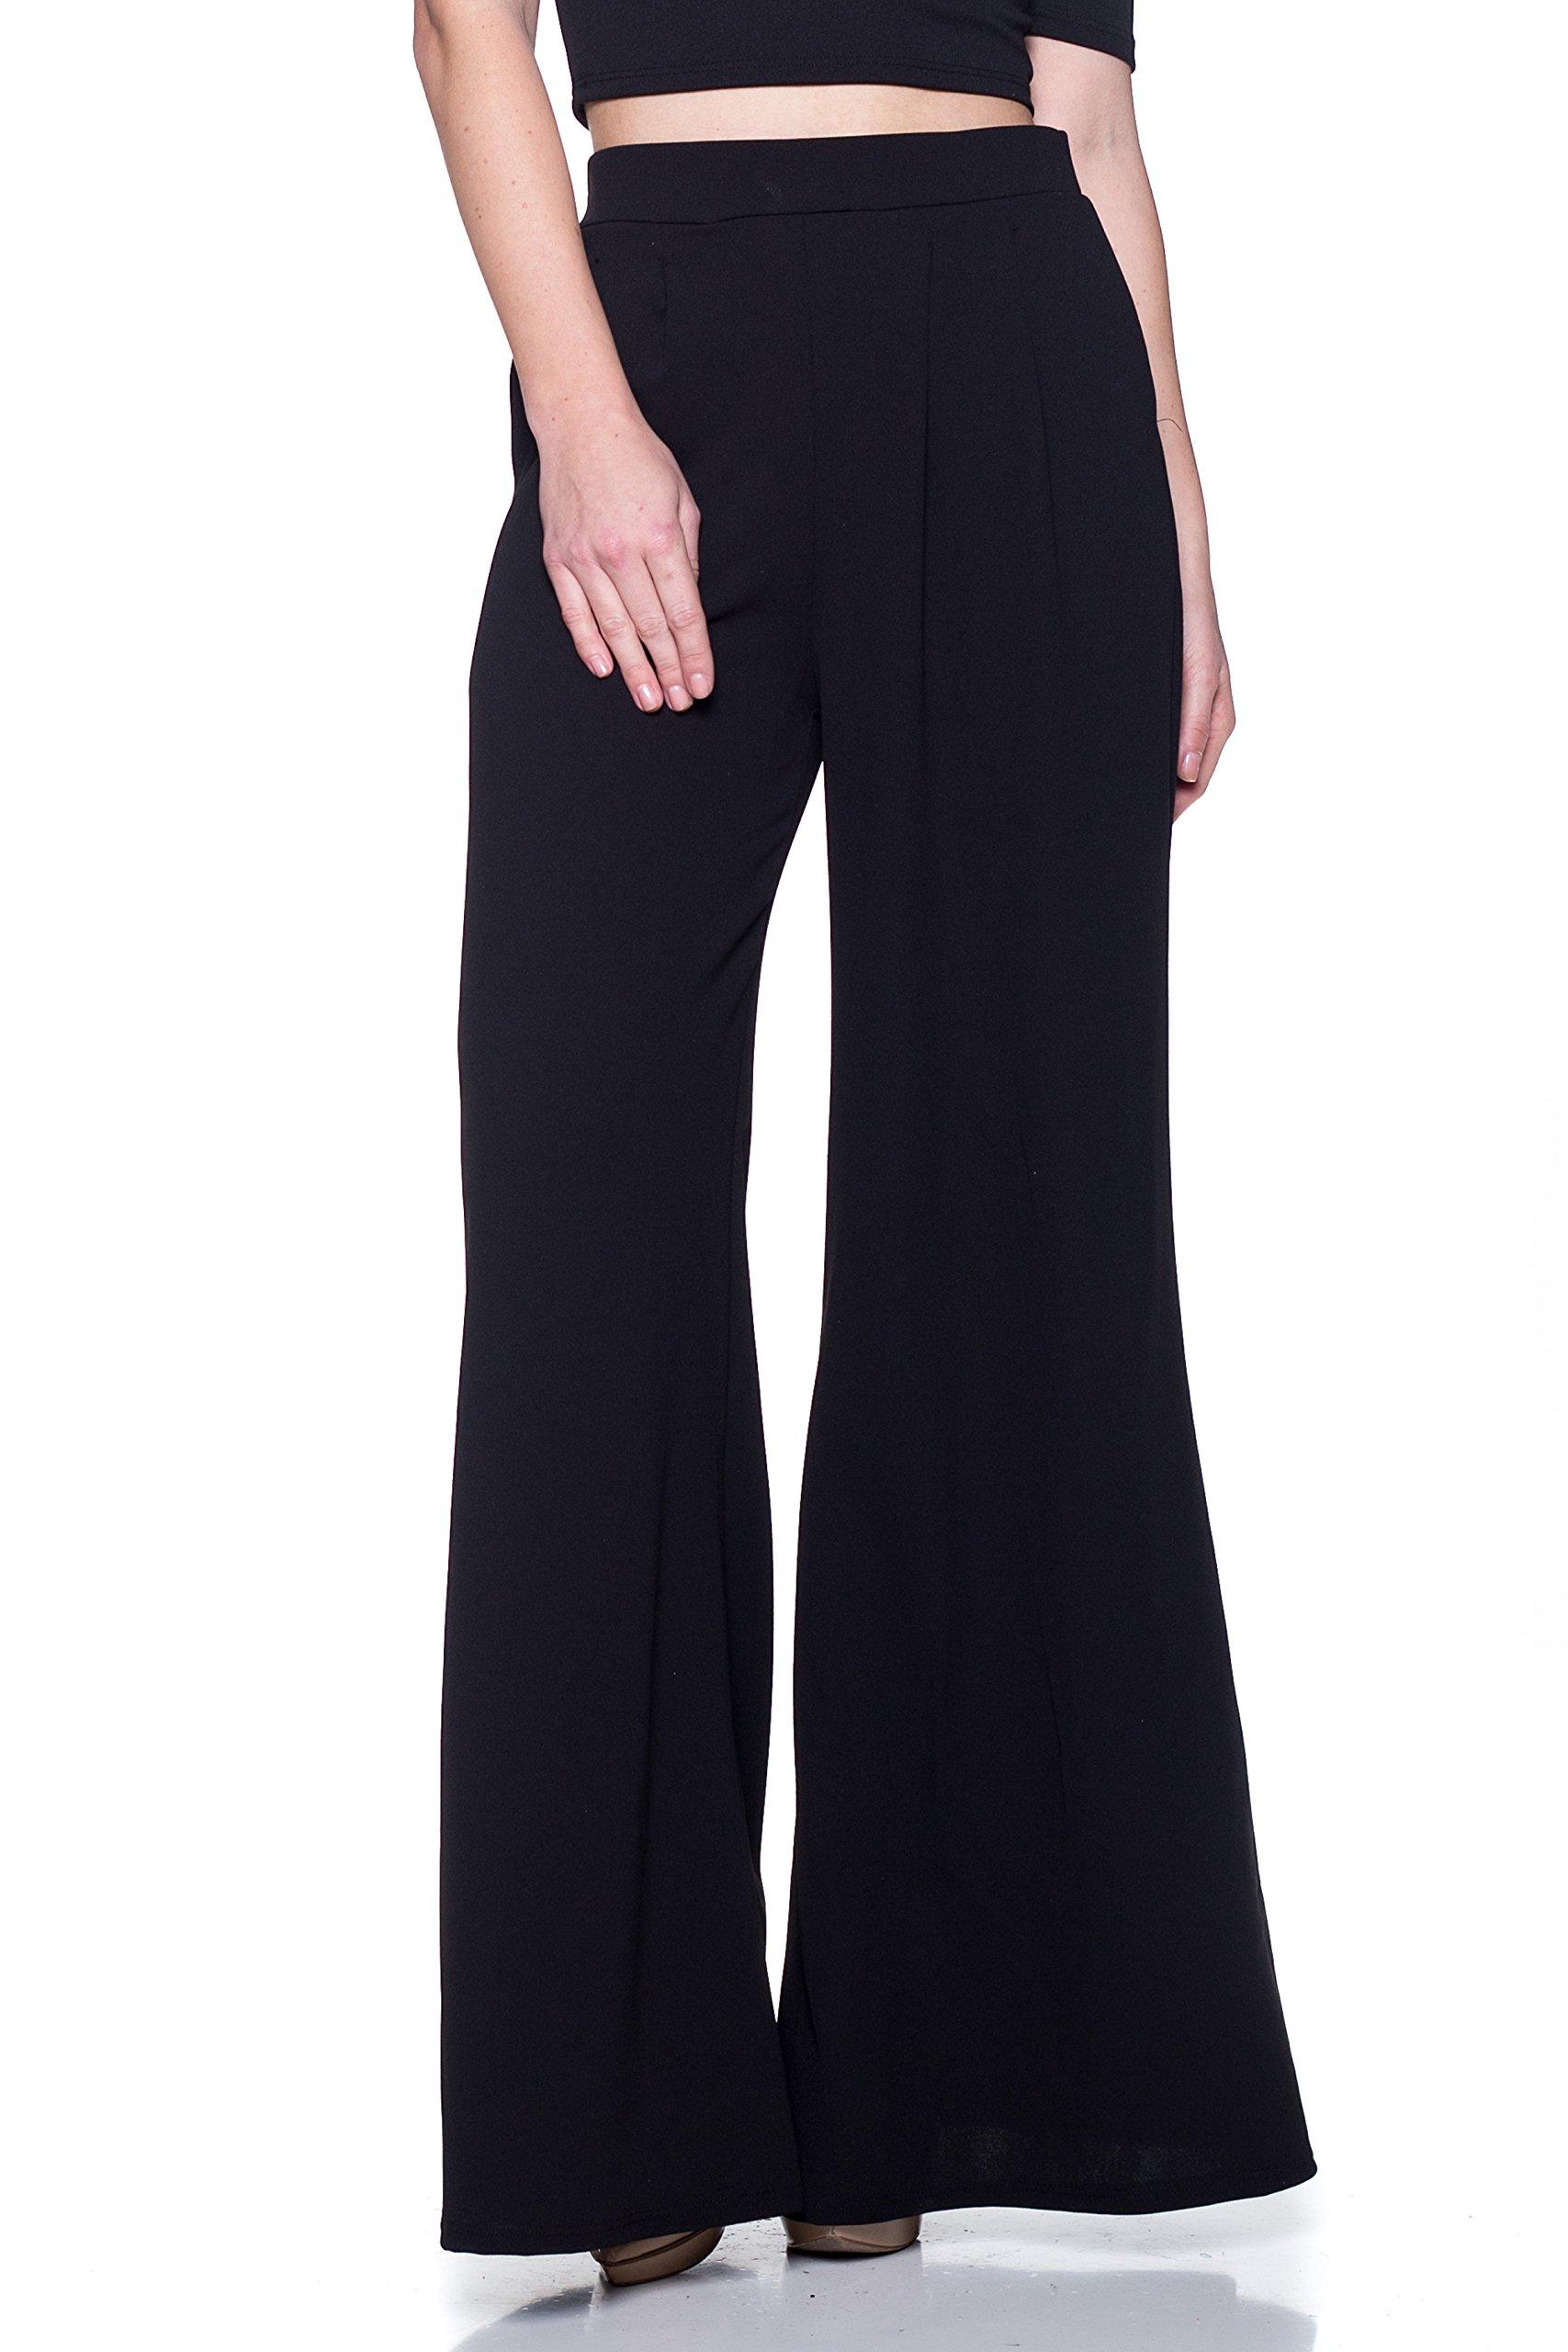 Cemi Ceri Women's J2 Love Wide Leg Palazzo Pants, Medium, Black